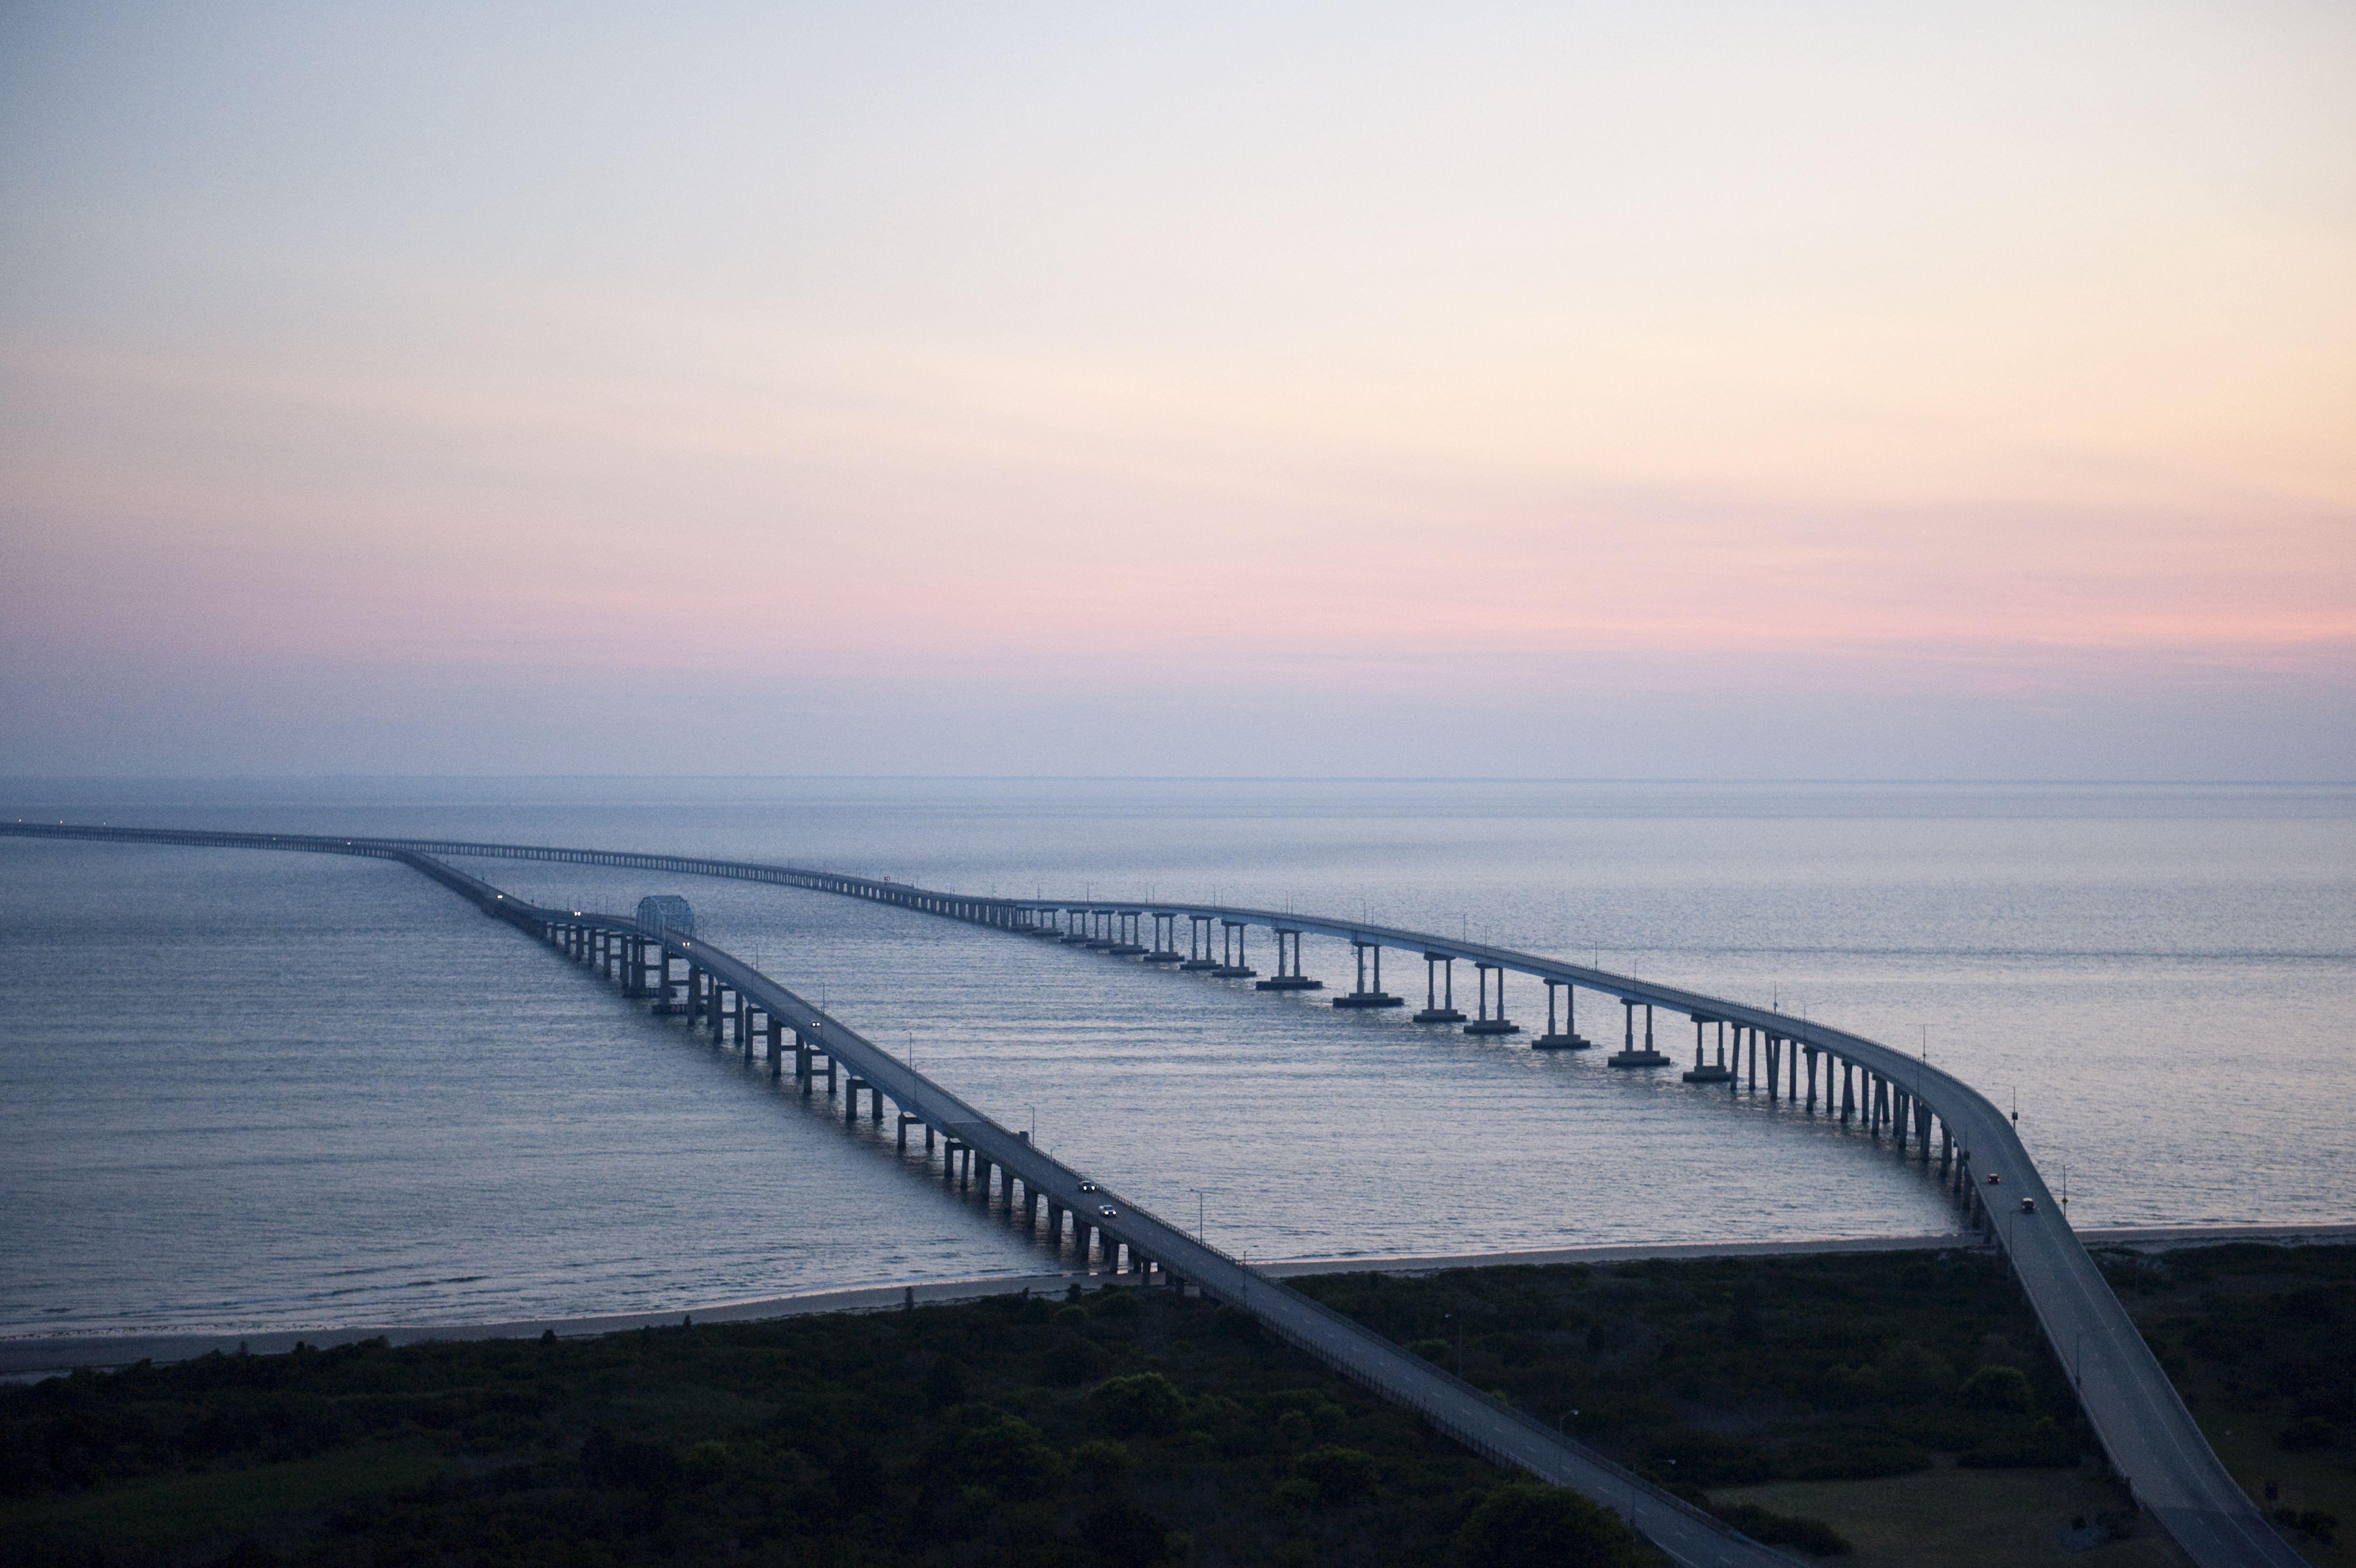 Chesapeake Bay Bridge Tunnel - VA Eastern Shore